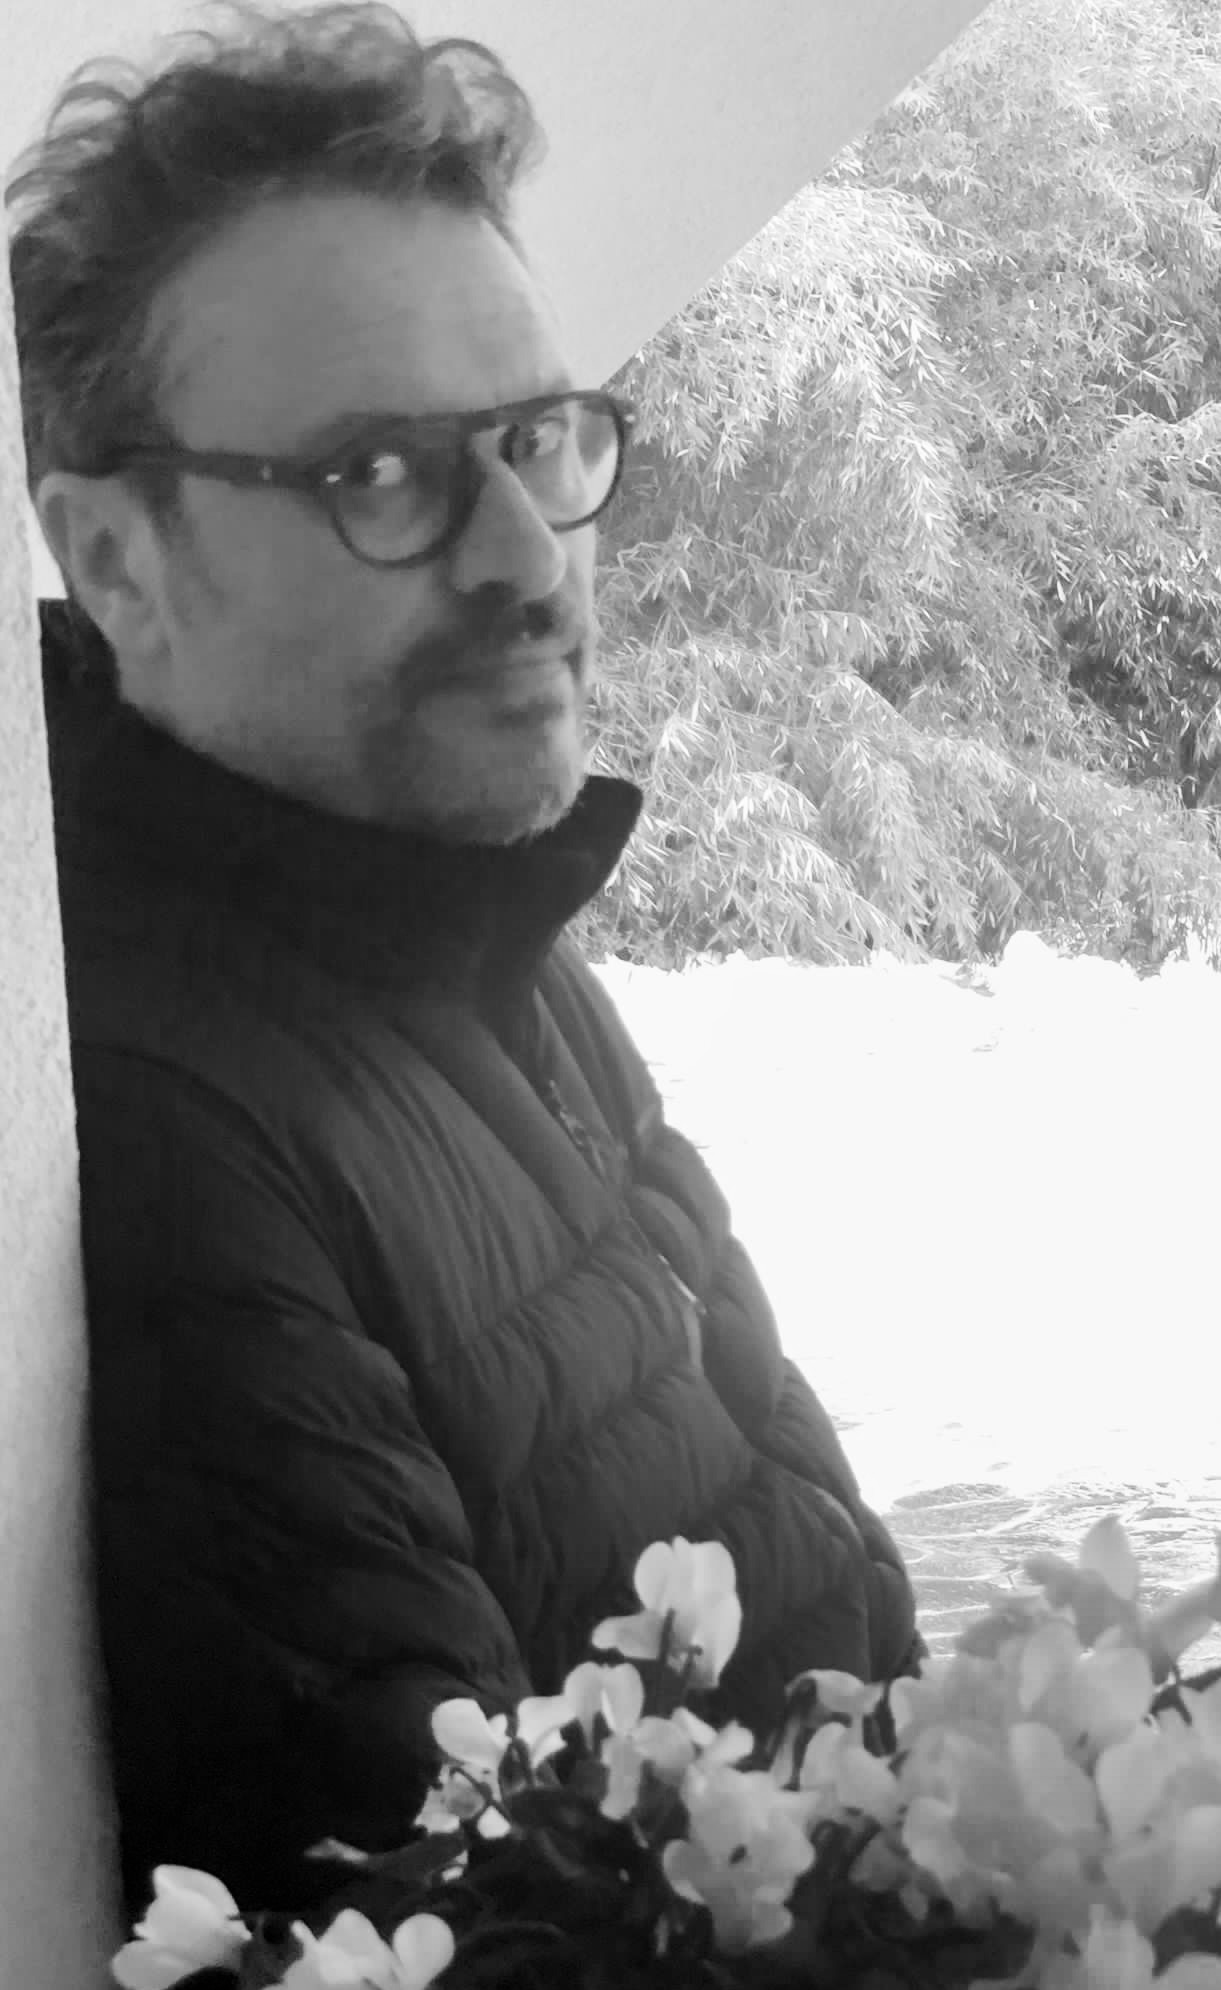 Carlo Matteo Callegaro